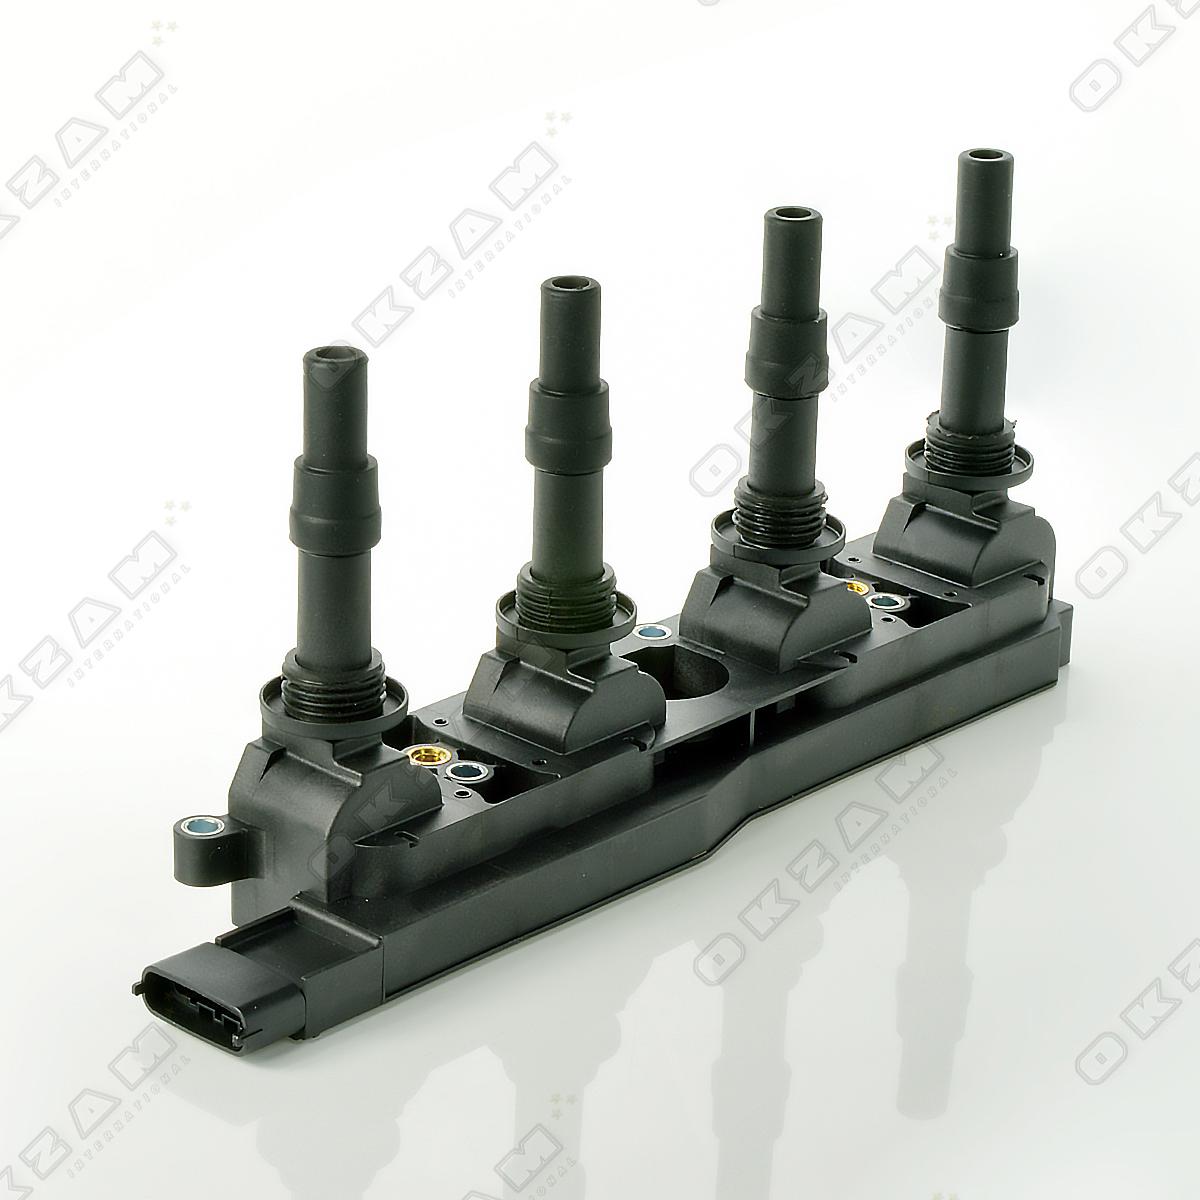 module d 39 allumage de la bobine d 39 allumage pour opel vectra. Black Bedroom Furniture Sets. Home Design Ideas